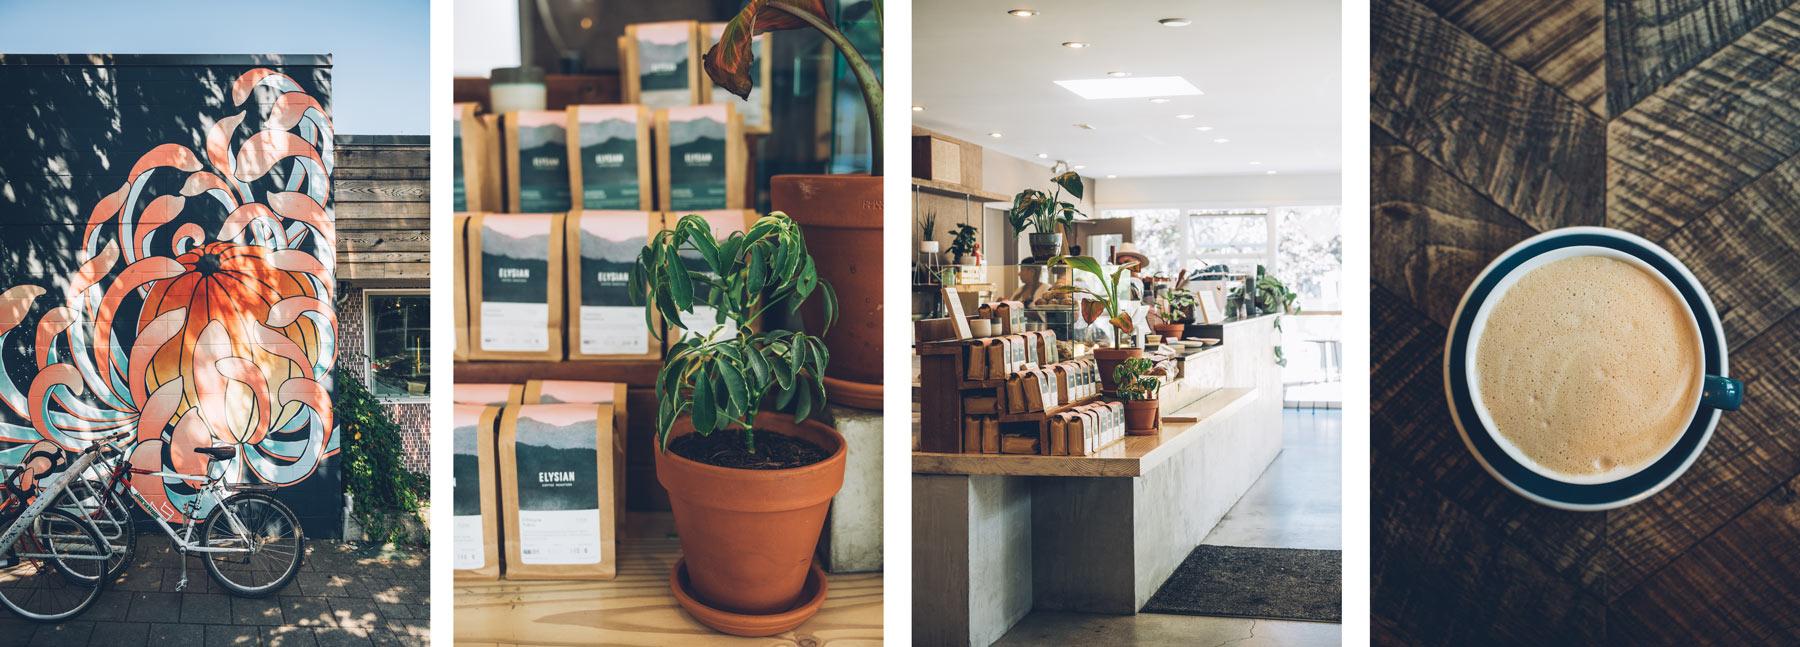 Café sympa Vancouver